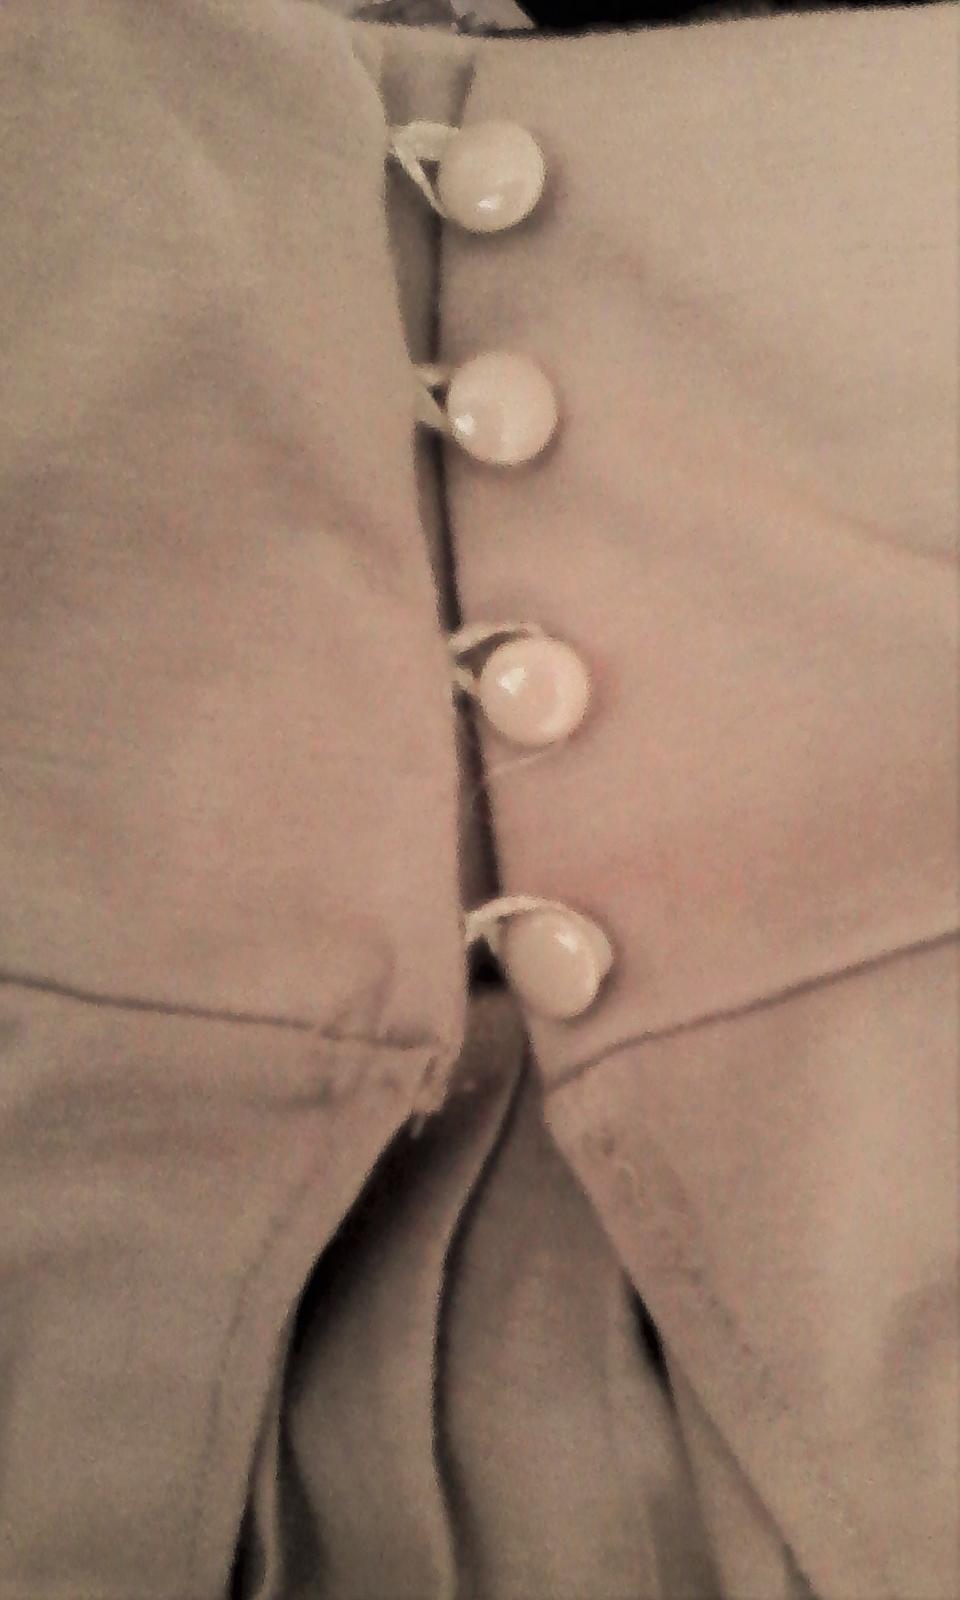 elegantná krémová blúzka / top č. 36 - 38  - Obrázok č. 2